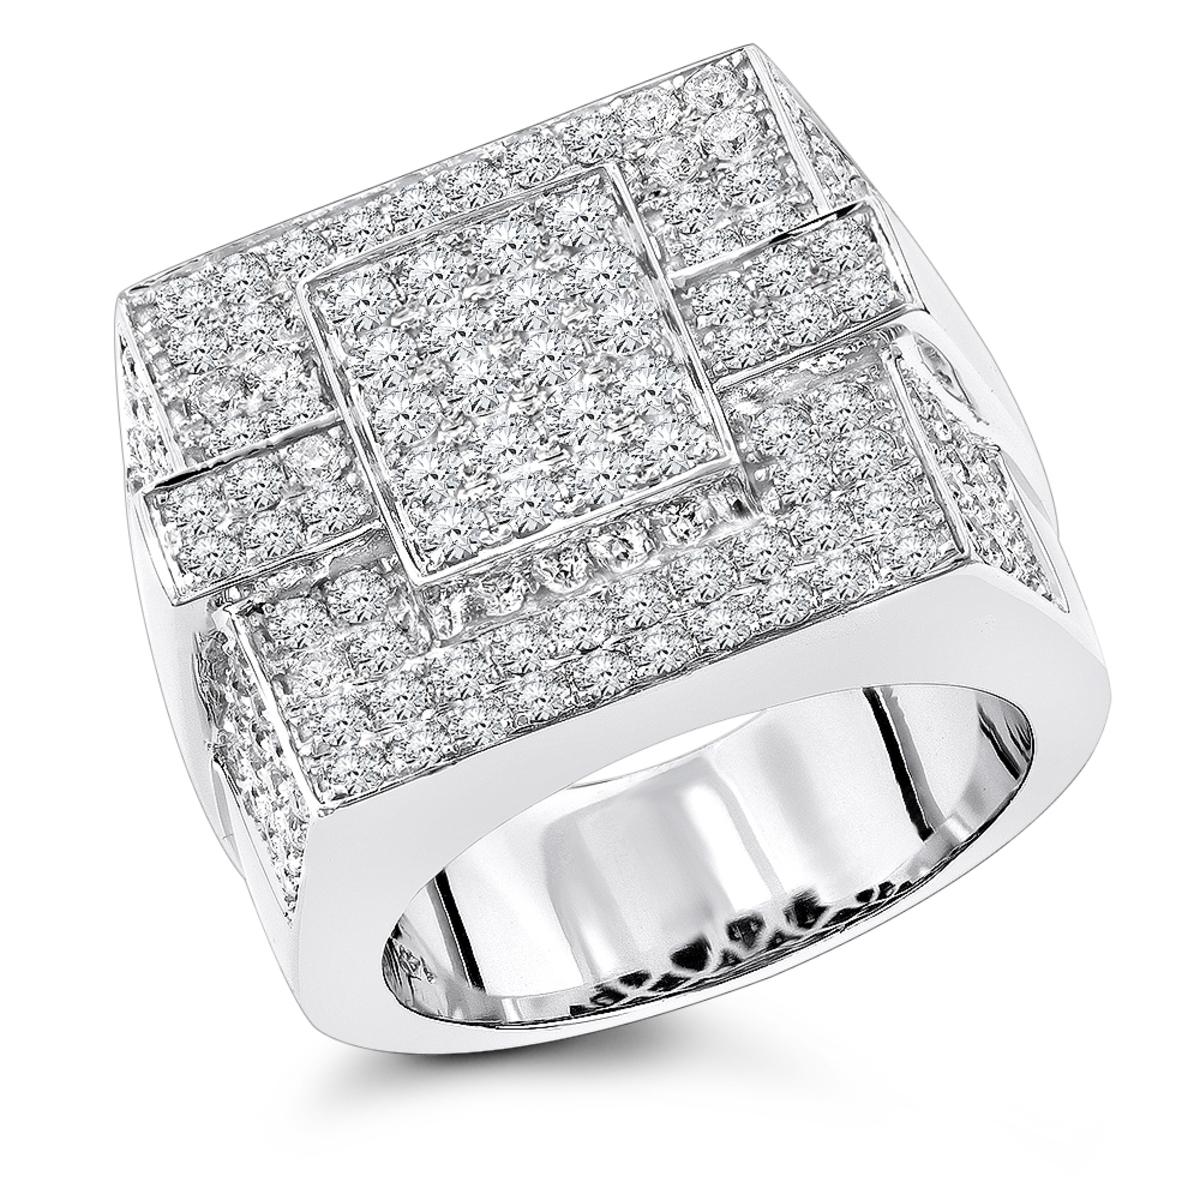 14K Gold Mens Pave Diamond Ring 4 Carats of Diamonds